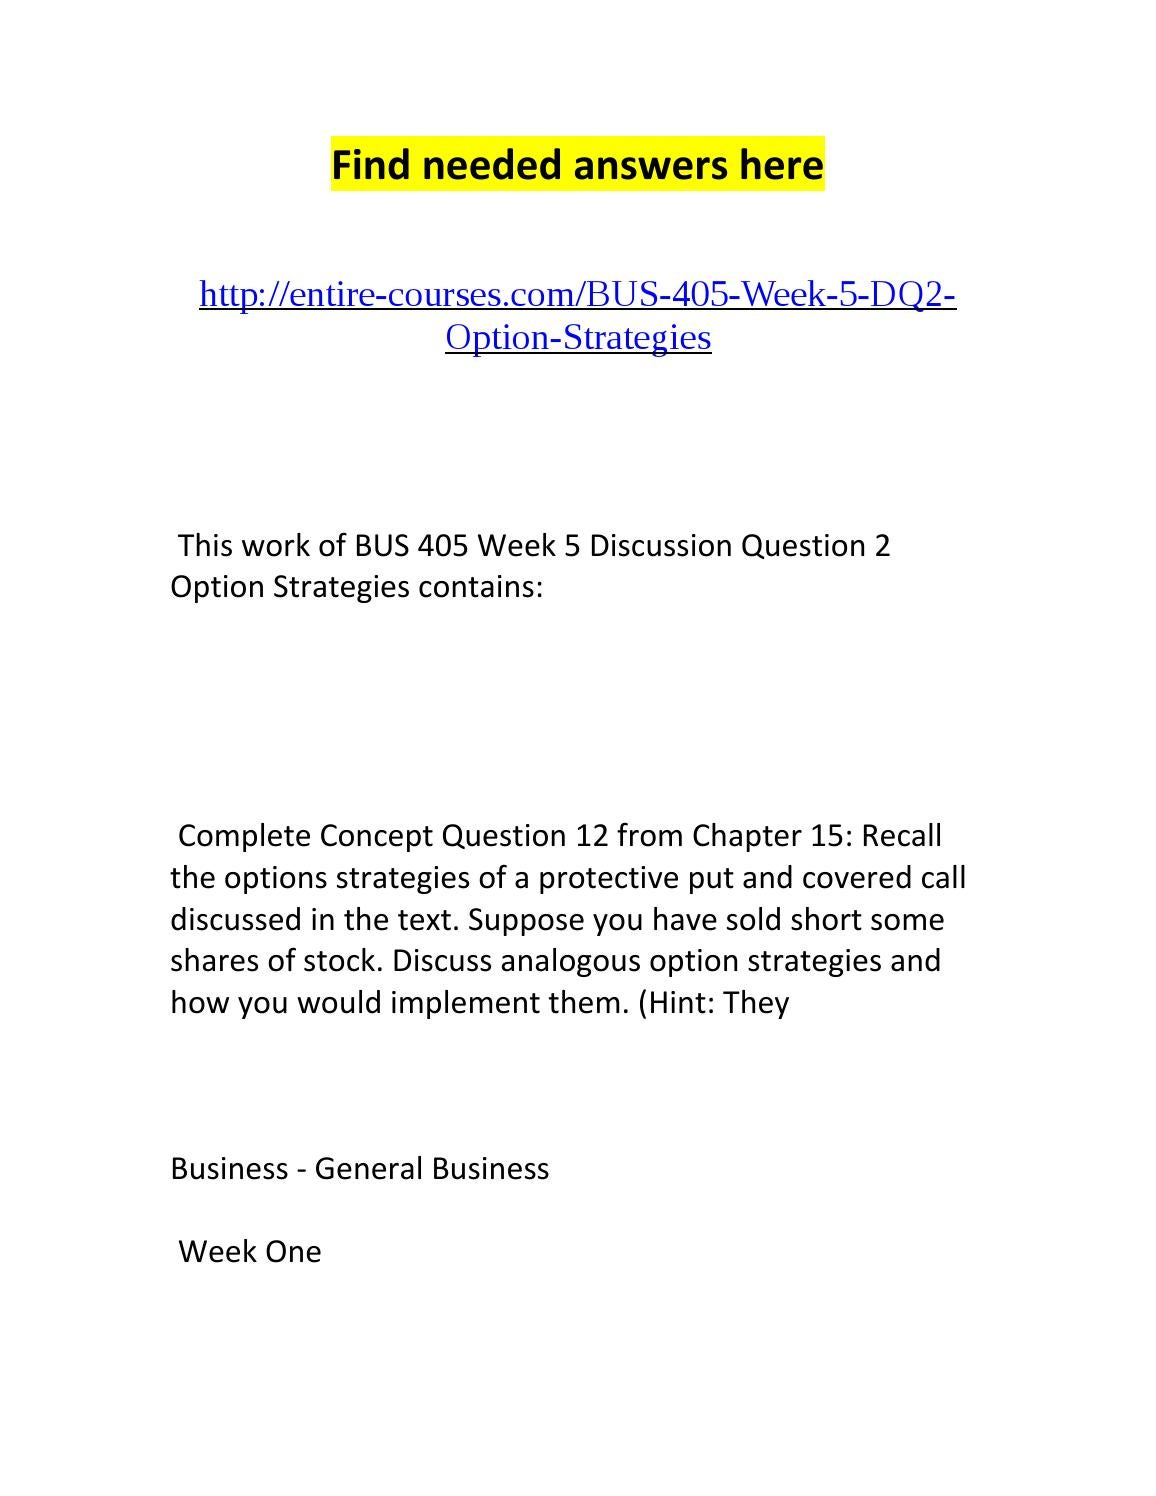 9 presentation(s) on 'blume'